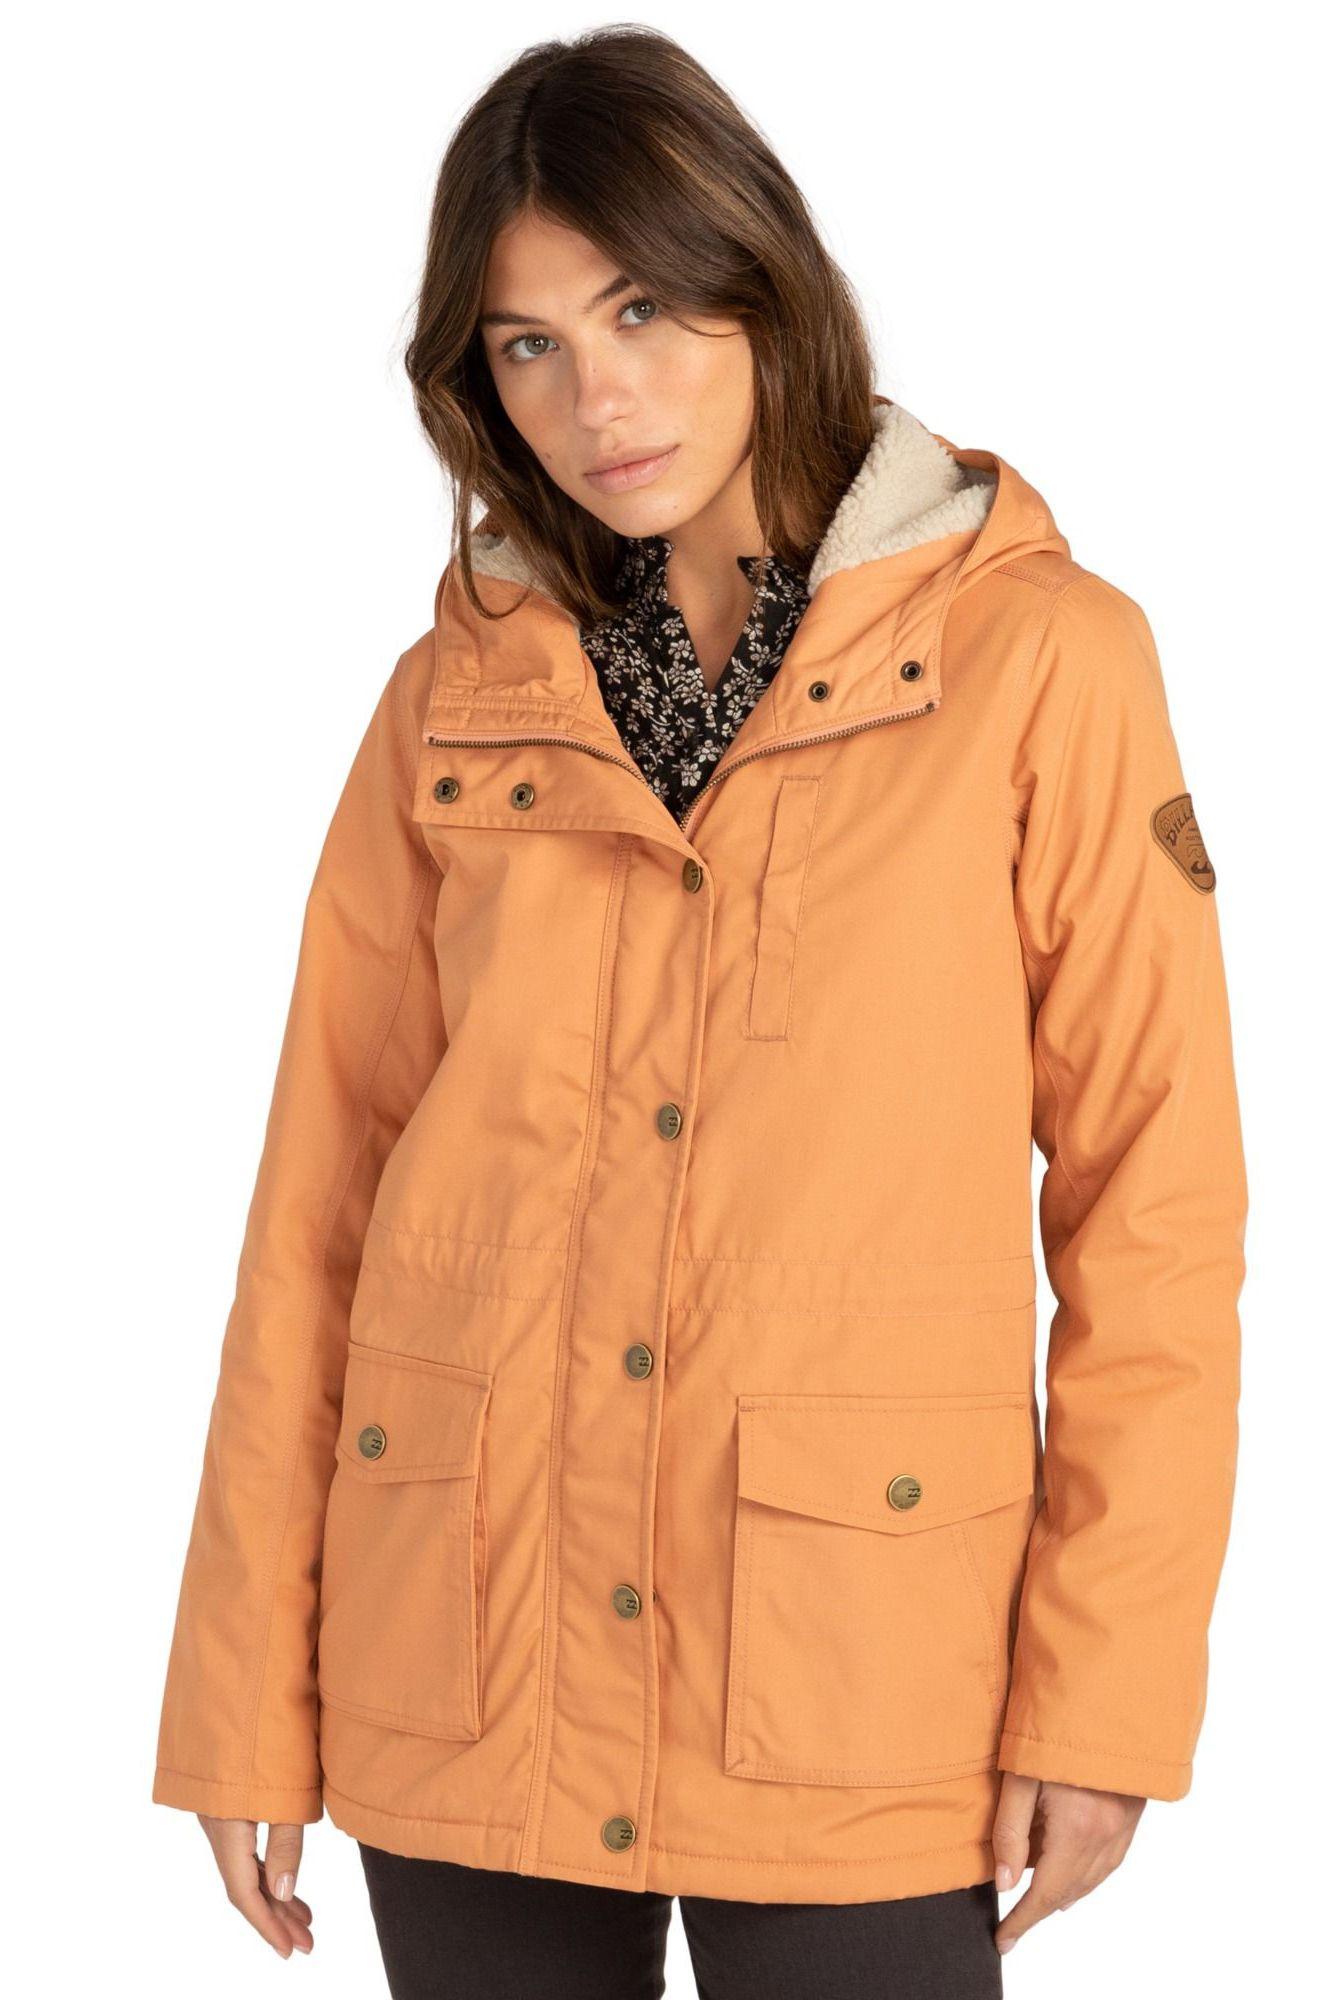 Billabong Jacket FACIL ITI PARADISE FOUND Sandstone